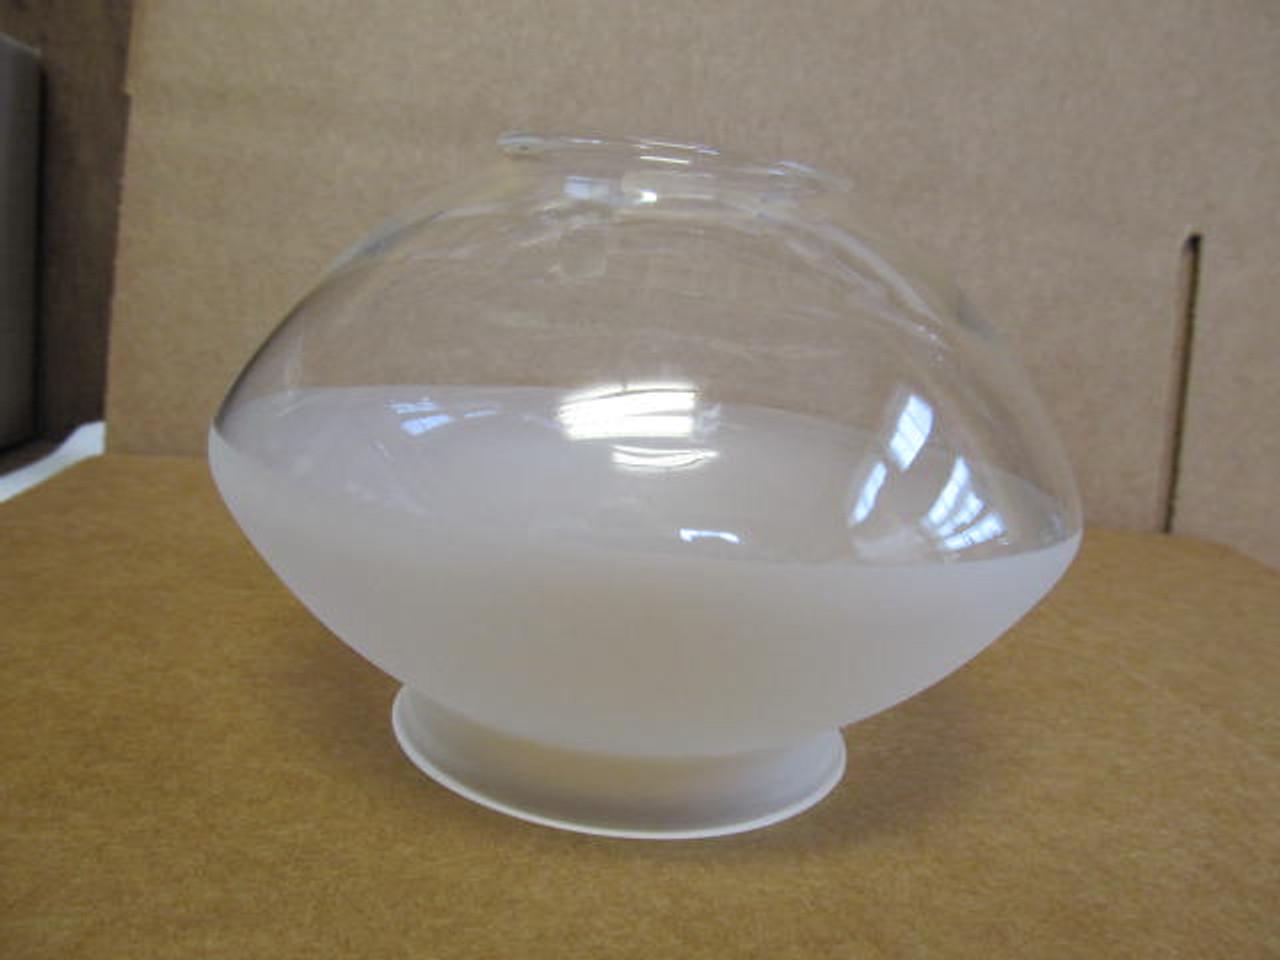 HUMPHREY REPLACEMENT GAS LIGHT GLASS GLOBE(18-3025)